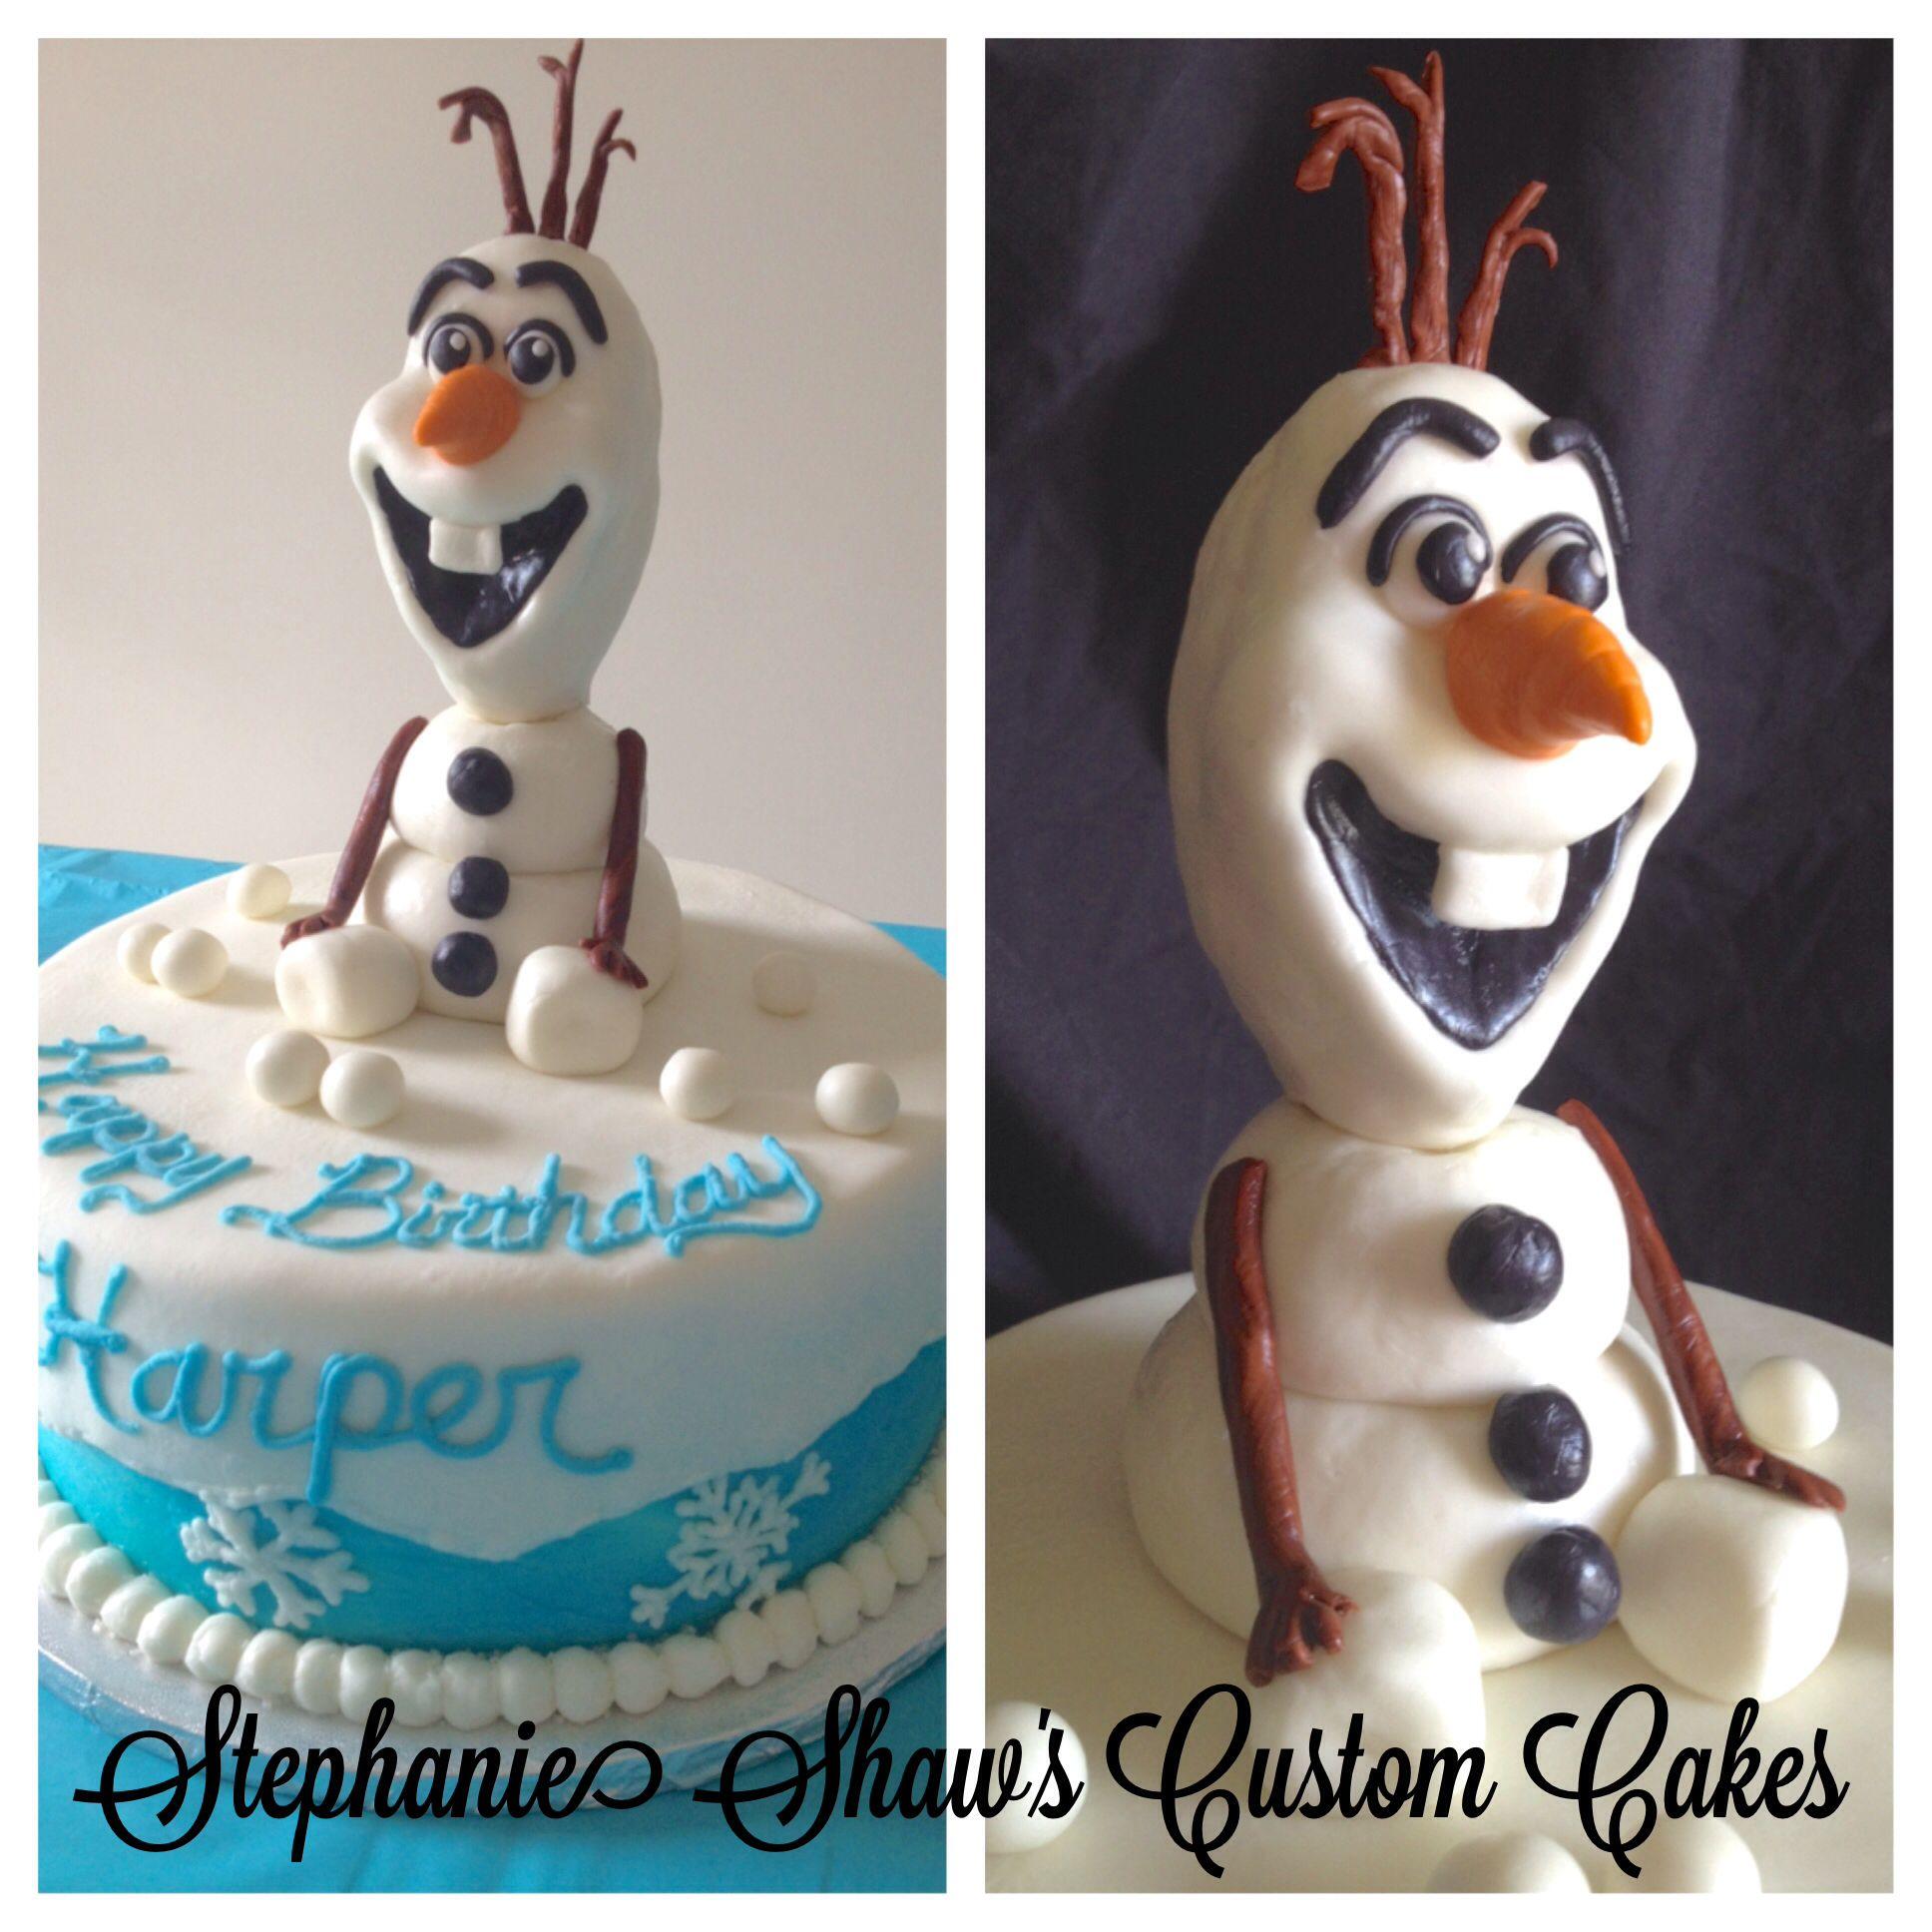 Hi Im Olaf And I Like Warm Hugs My Facebook Page